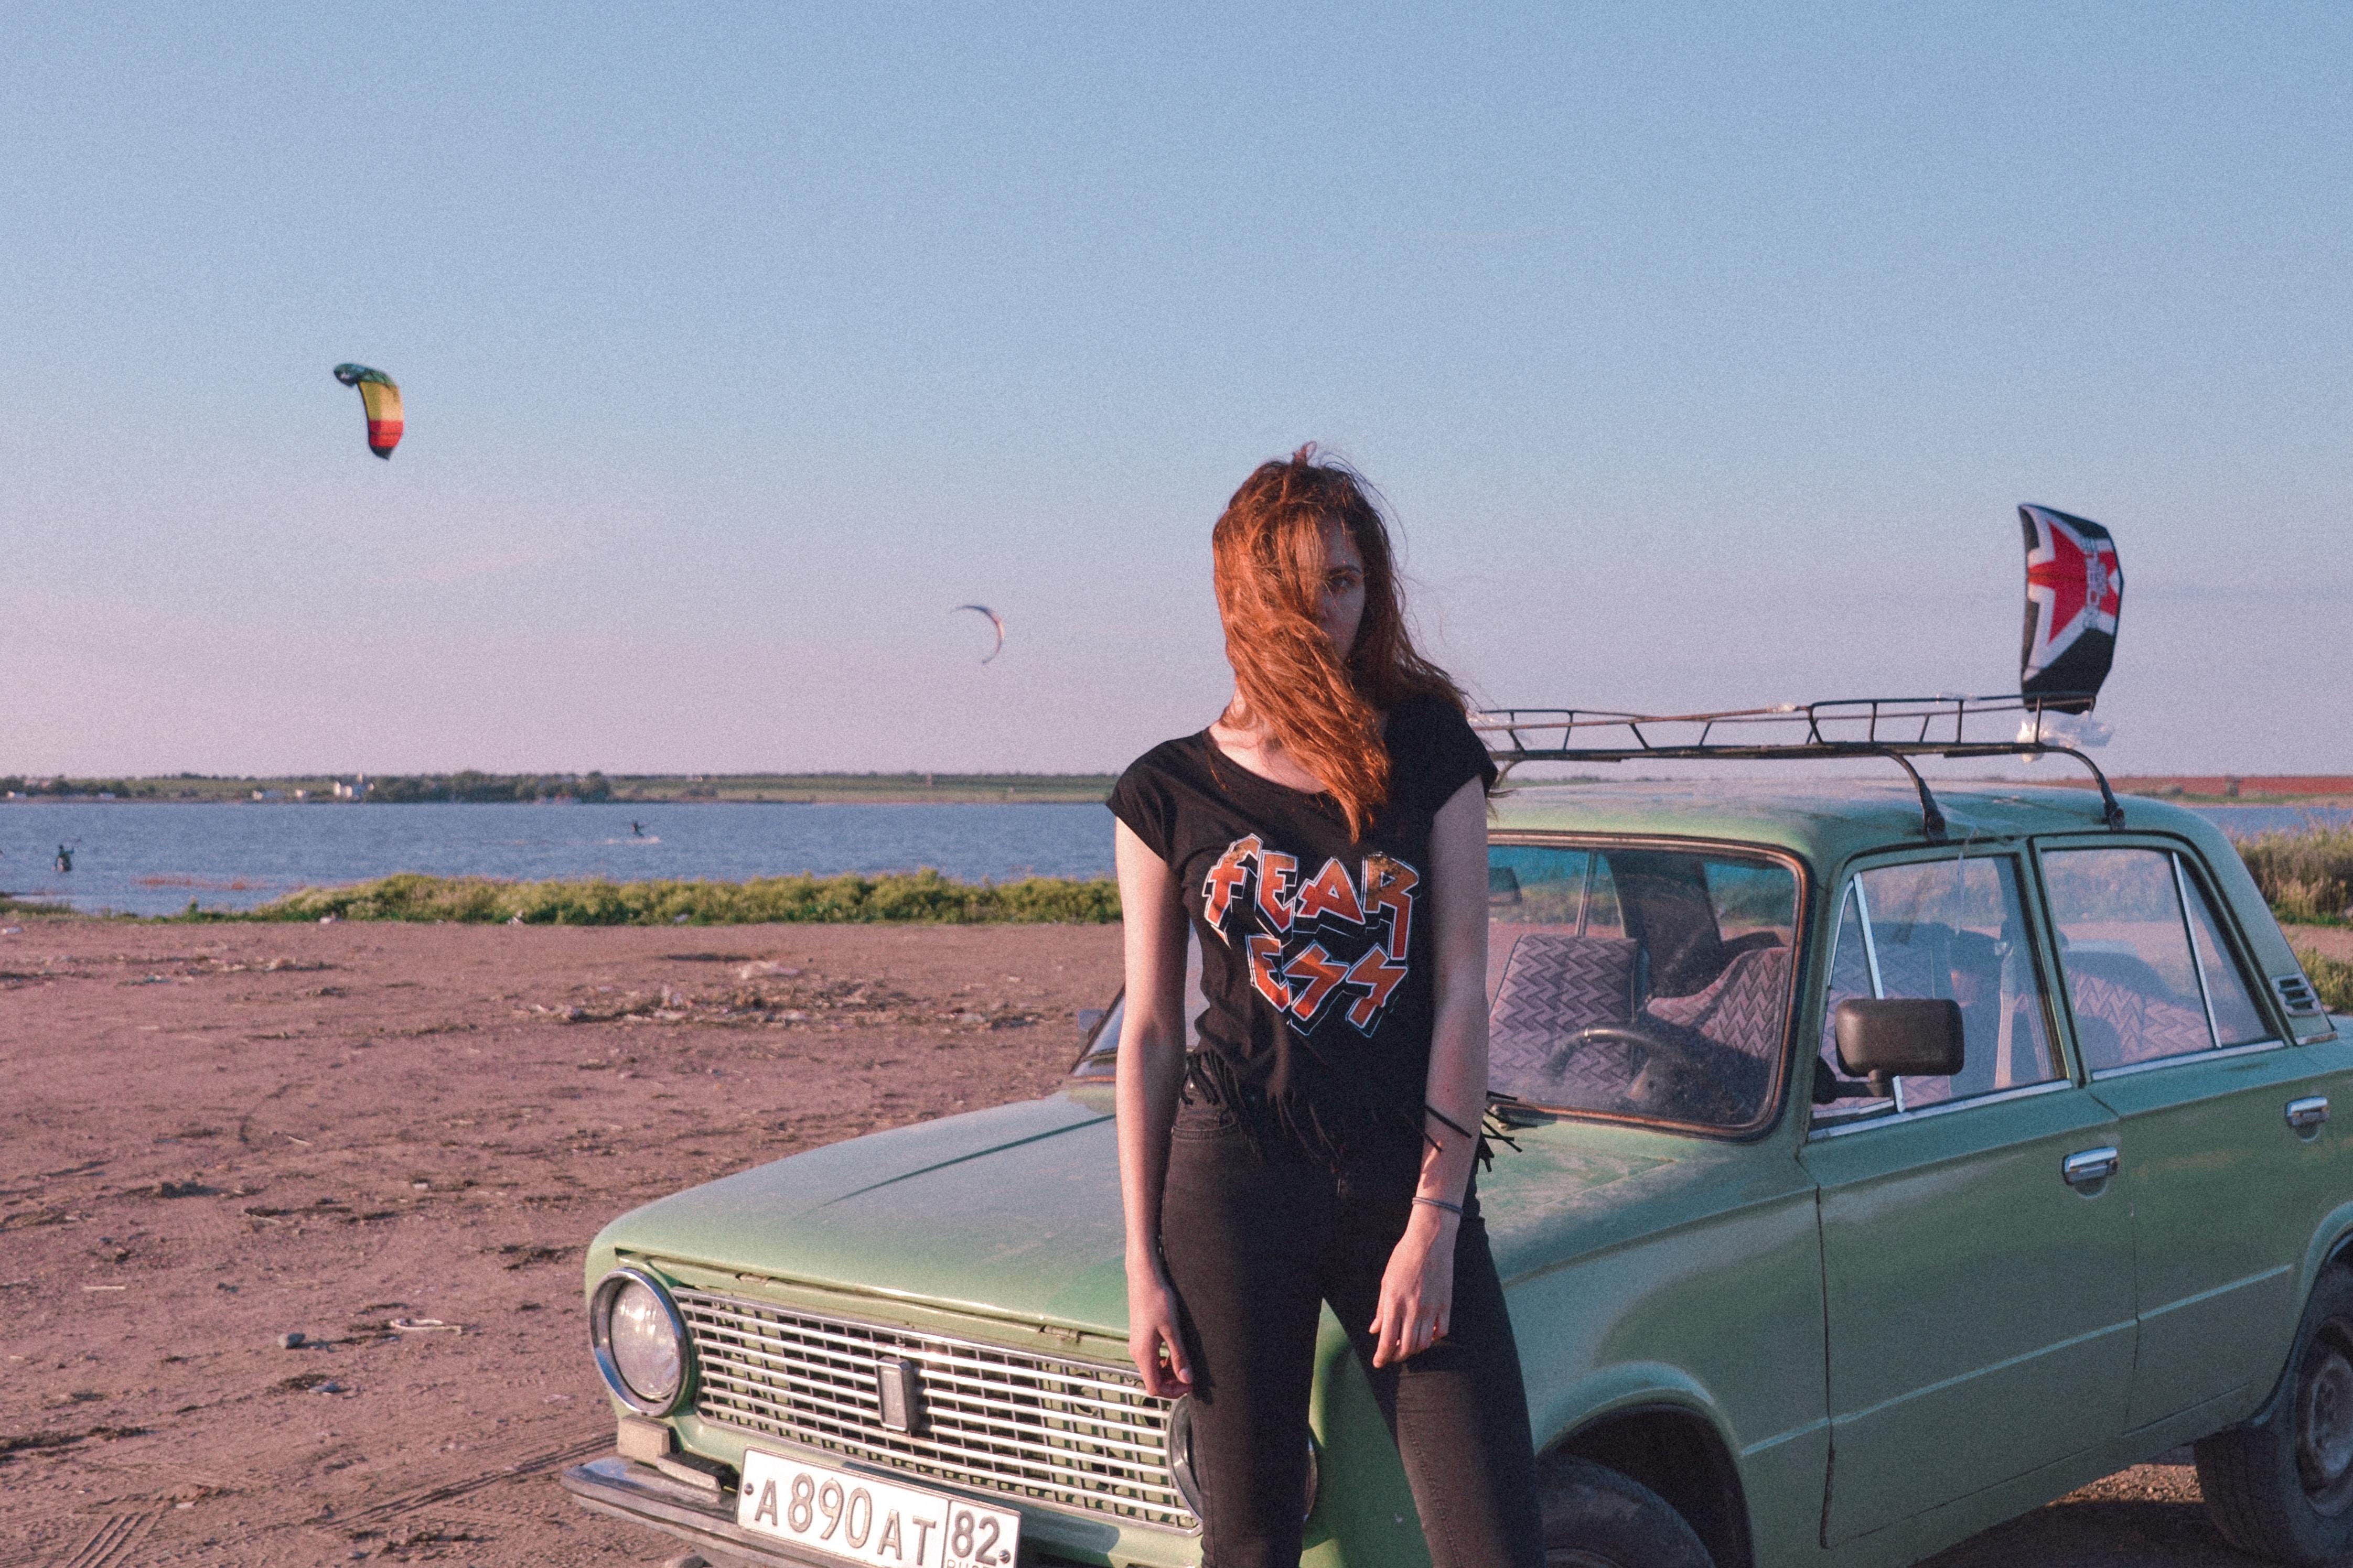 woman standing near blue car on seashore